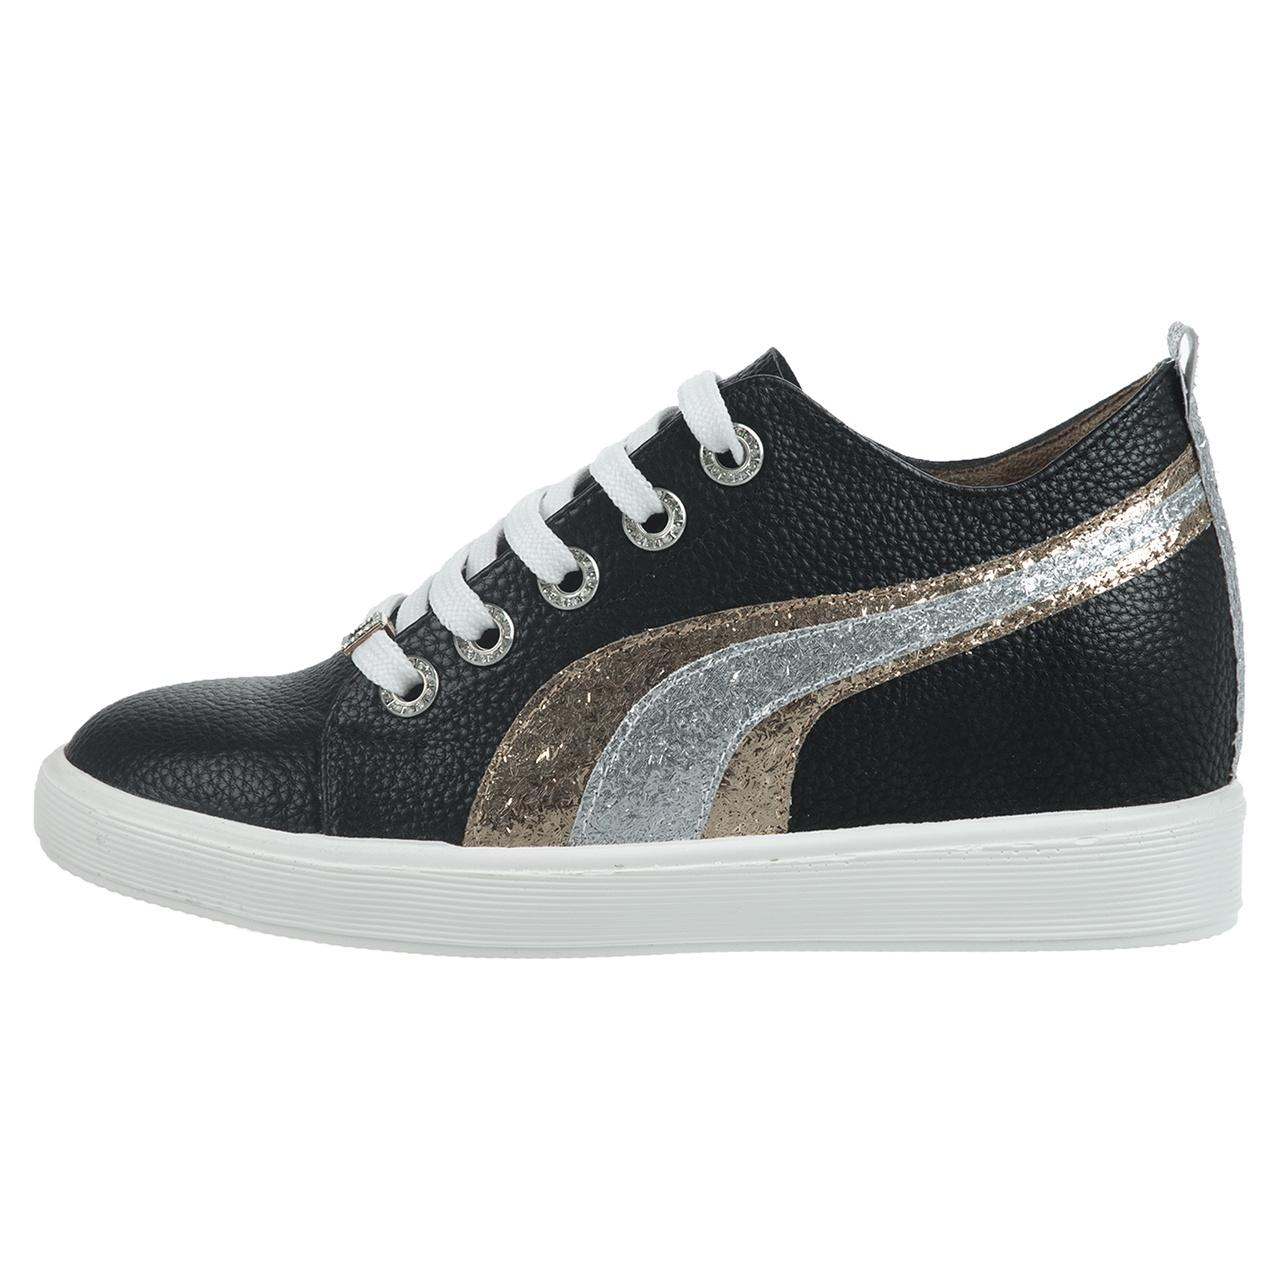 کفش زنانه  مدل پانیذ کد 019